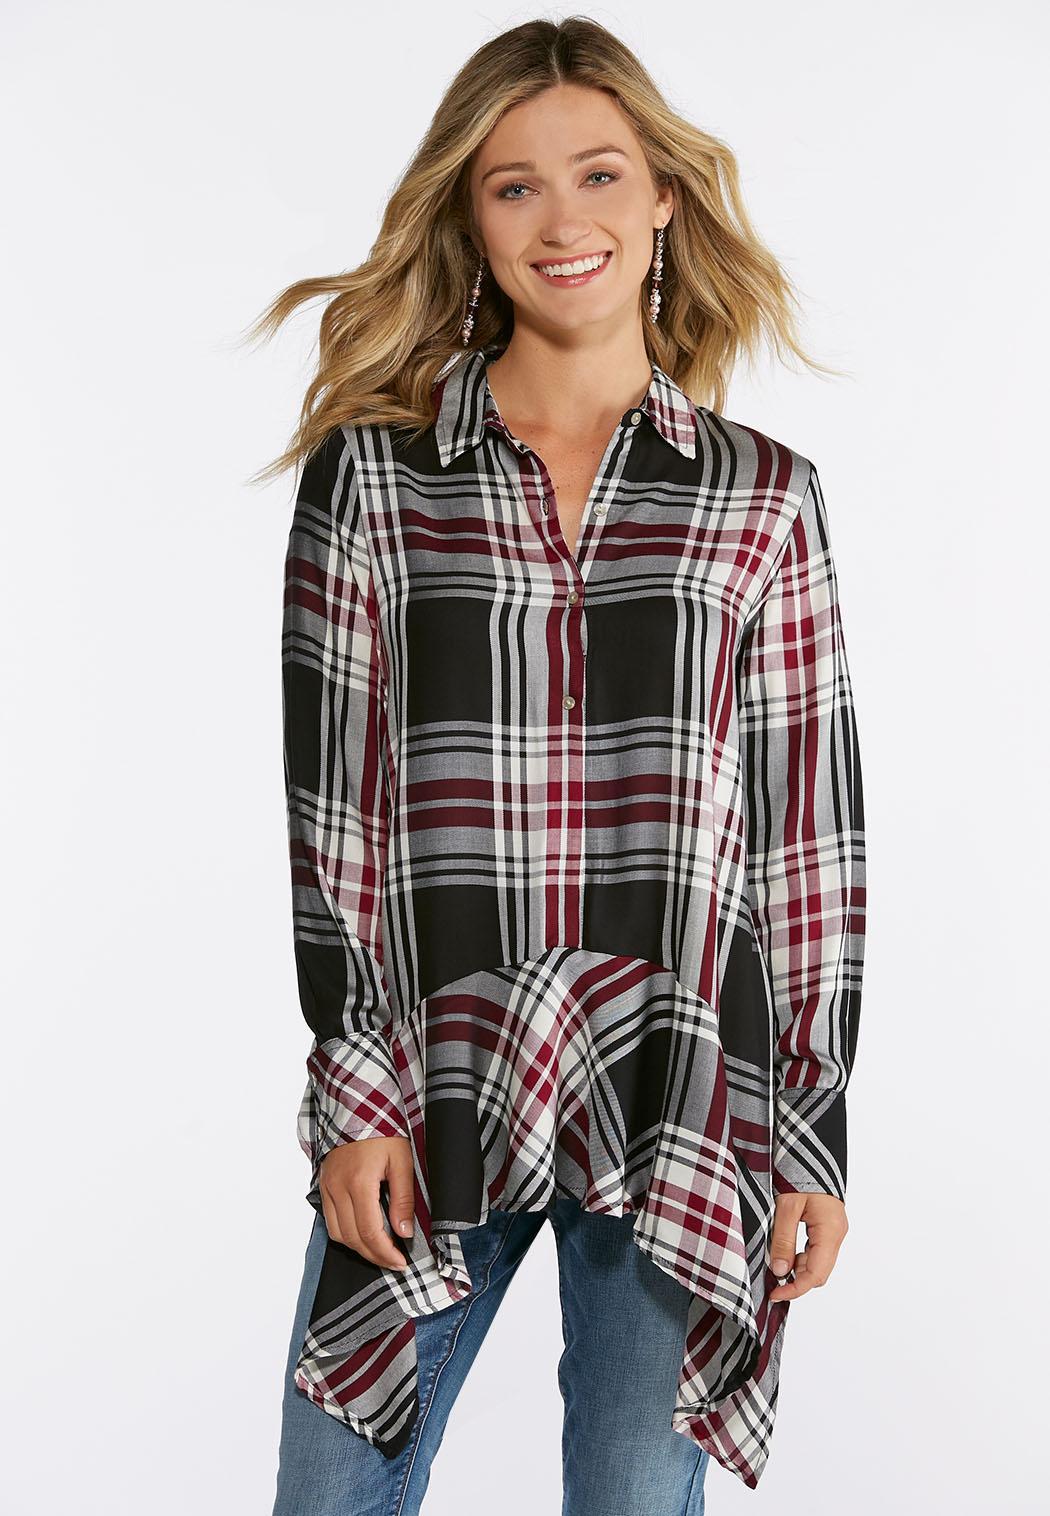 cbd812e577 Womens Denim Shirt With Pearl Snaps - BCD Tofu House